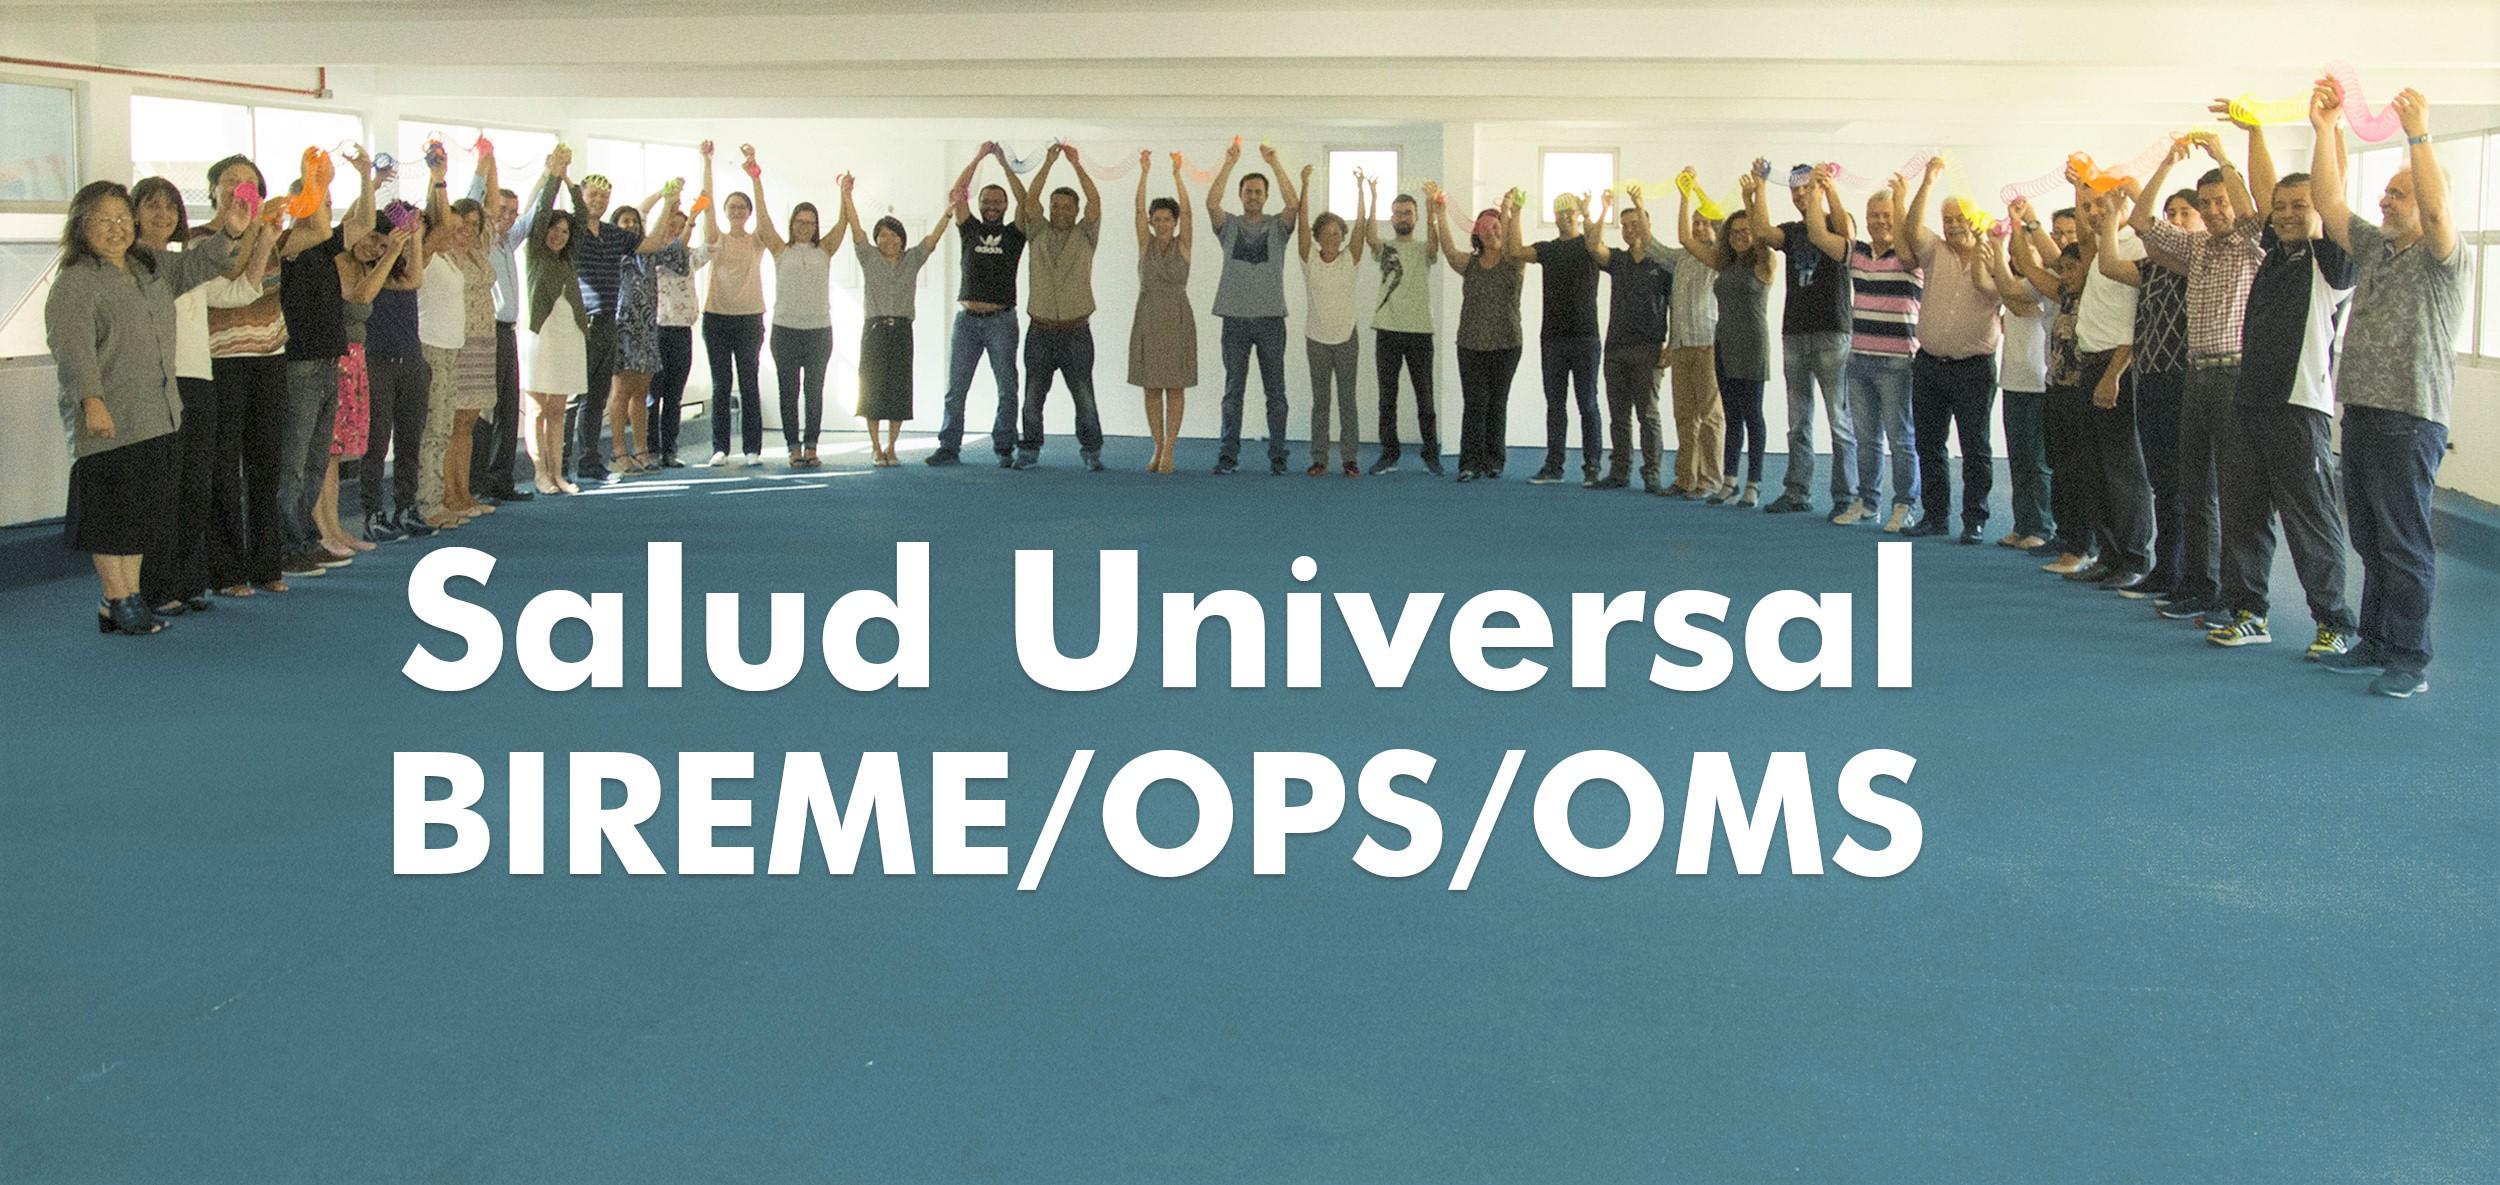 equipe-bireme-2019-salud-universal